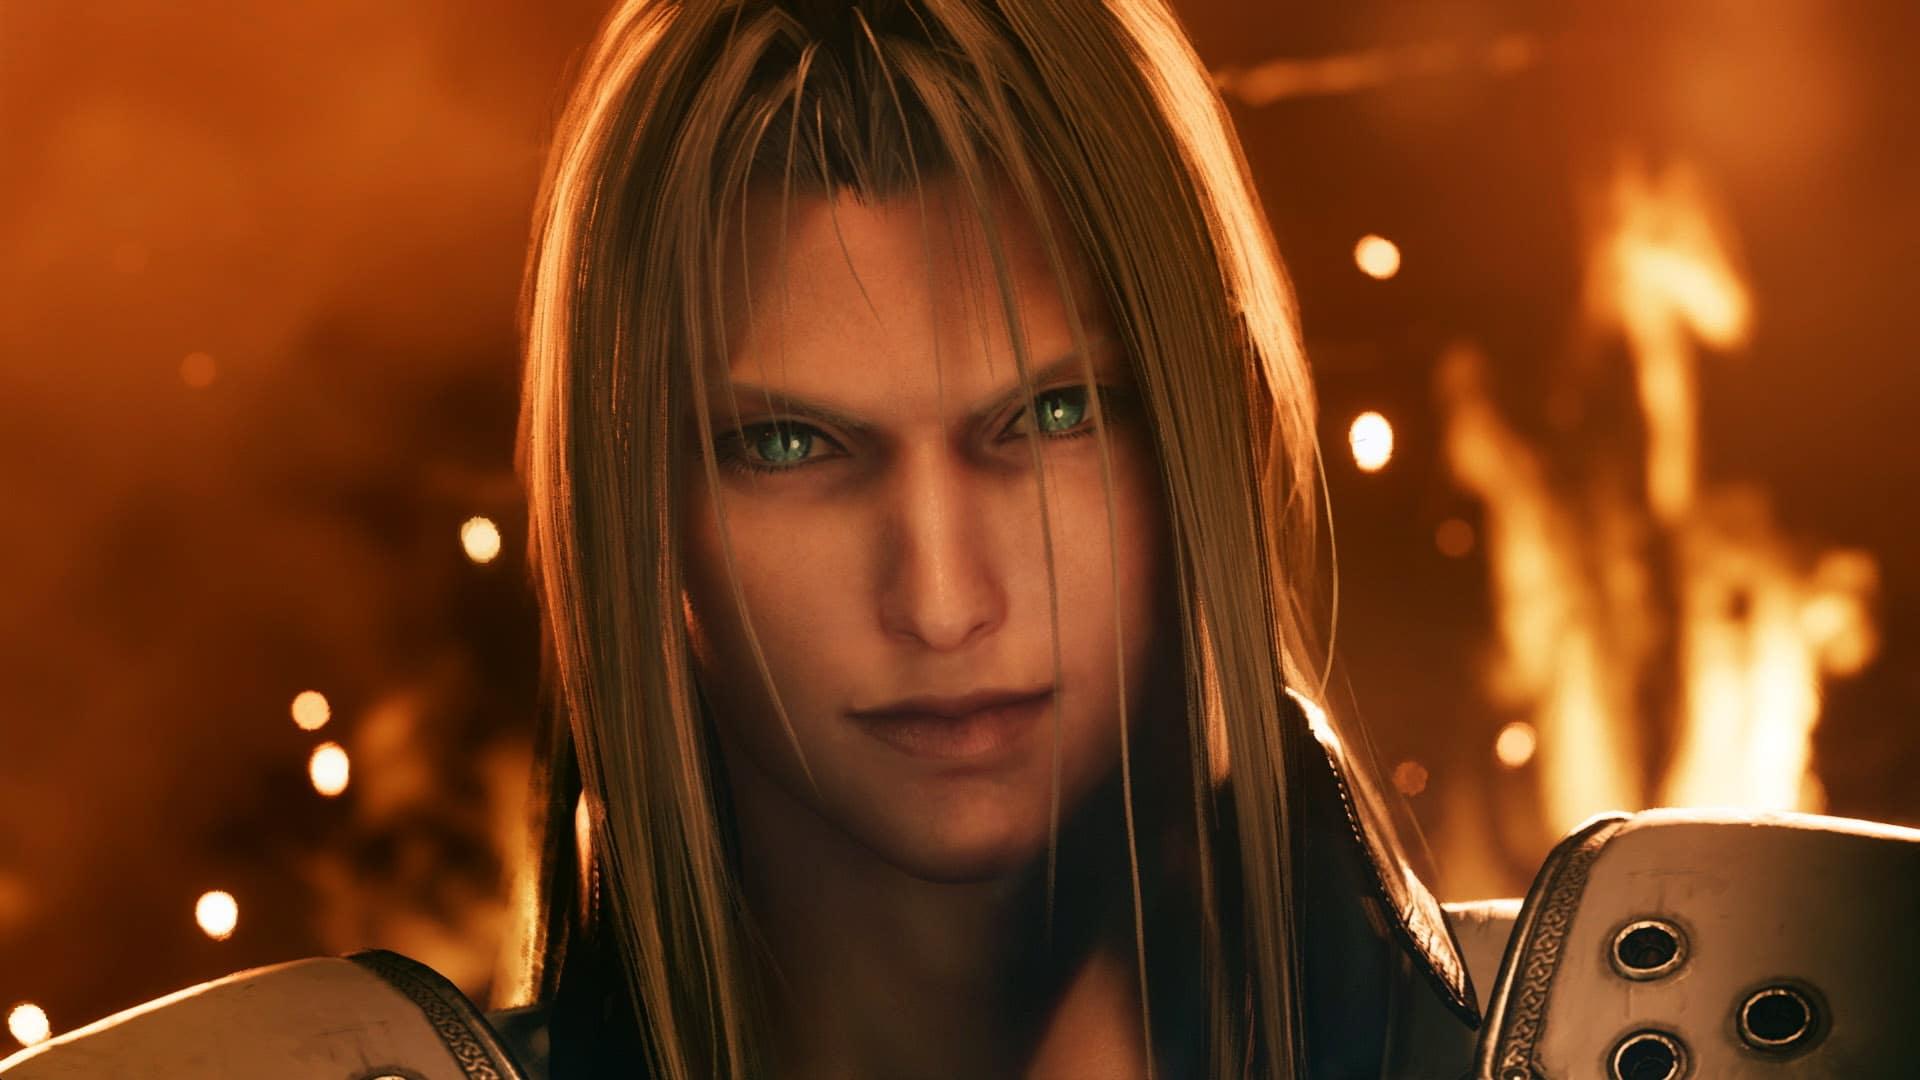 Un fan de Final Fantasy 7 comparte un boceto impresionante de Sephiroth, GamersRD